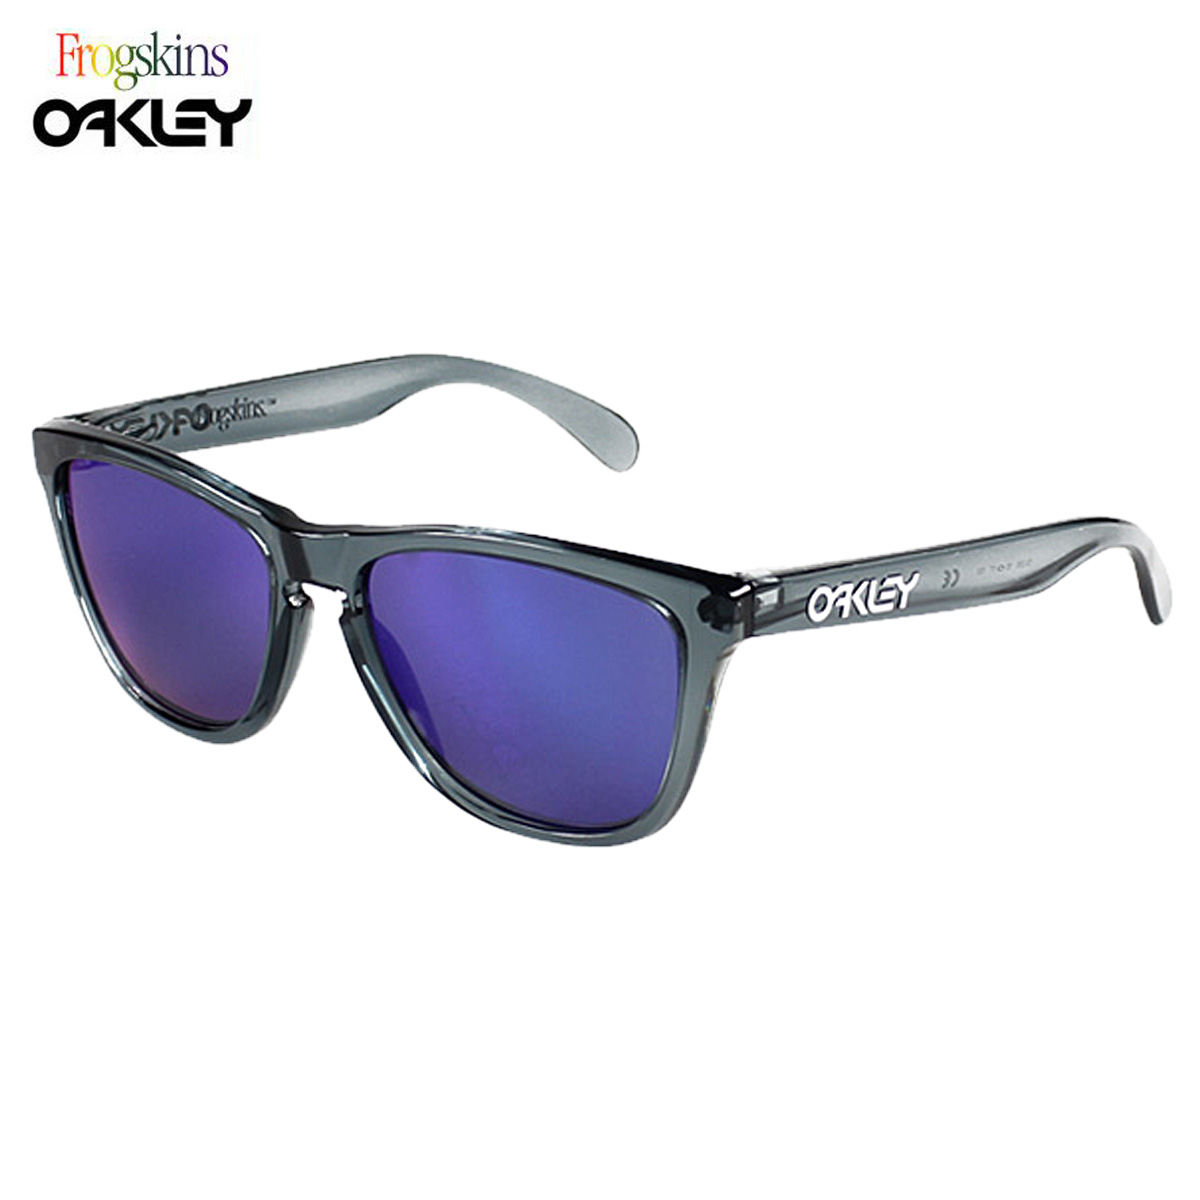 01d8e28d942b ... aliexpress allsports sold out oakley oakley sunglasses frogskins frog  skin glasses 03 289 crystal black red